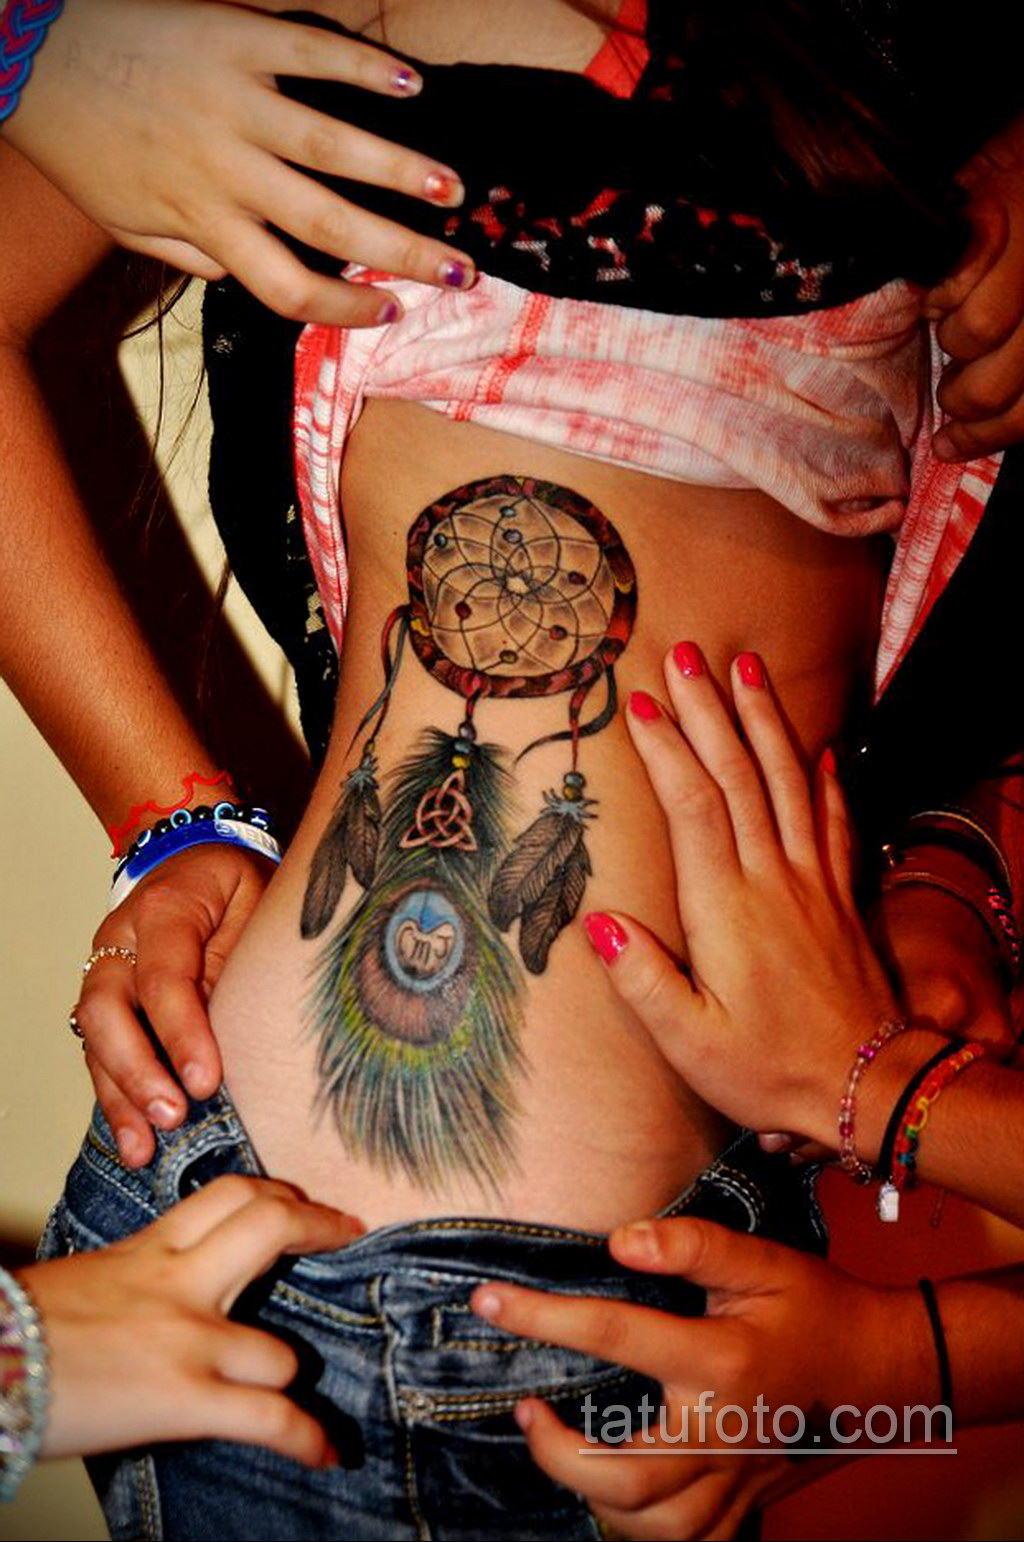 Фото рисунка тату с ловцом снов 22.11.2020 №131 -Dreamcatcher tattoo- tatufoto.com